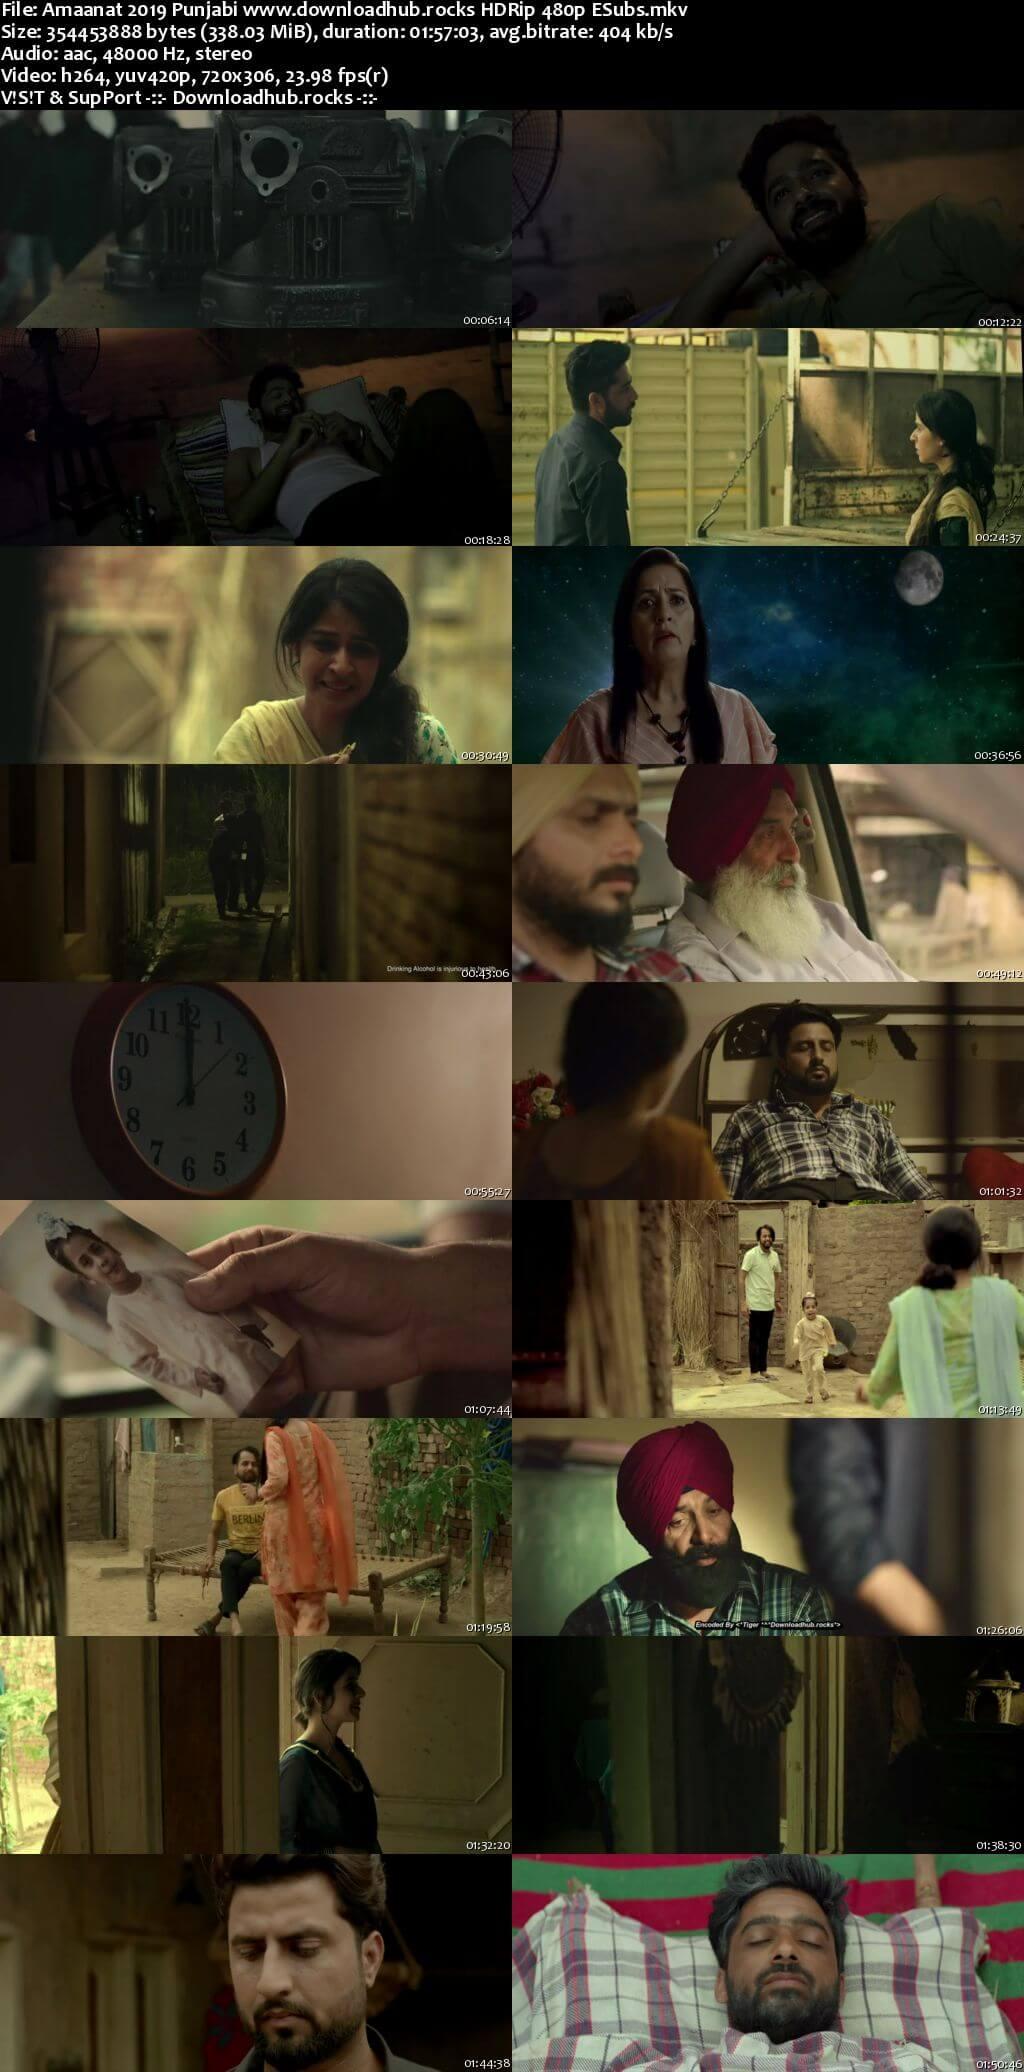 Amaanat 2019 Punjabi 300MB HDRip 480p ESubs